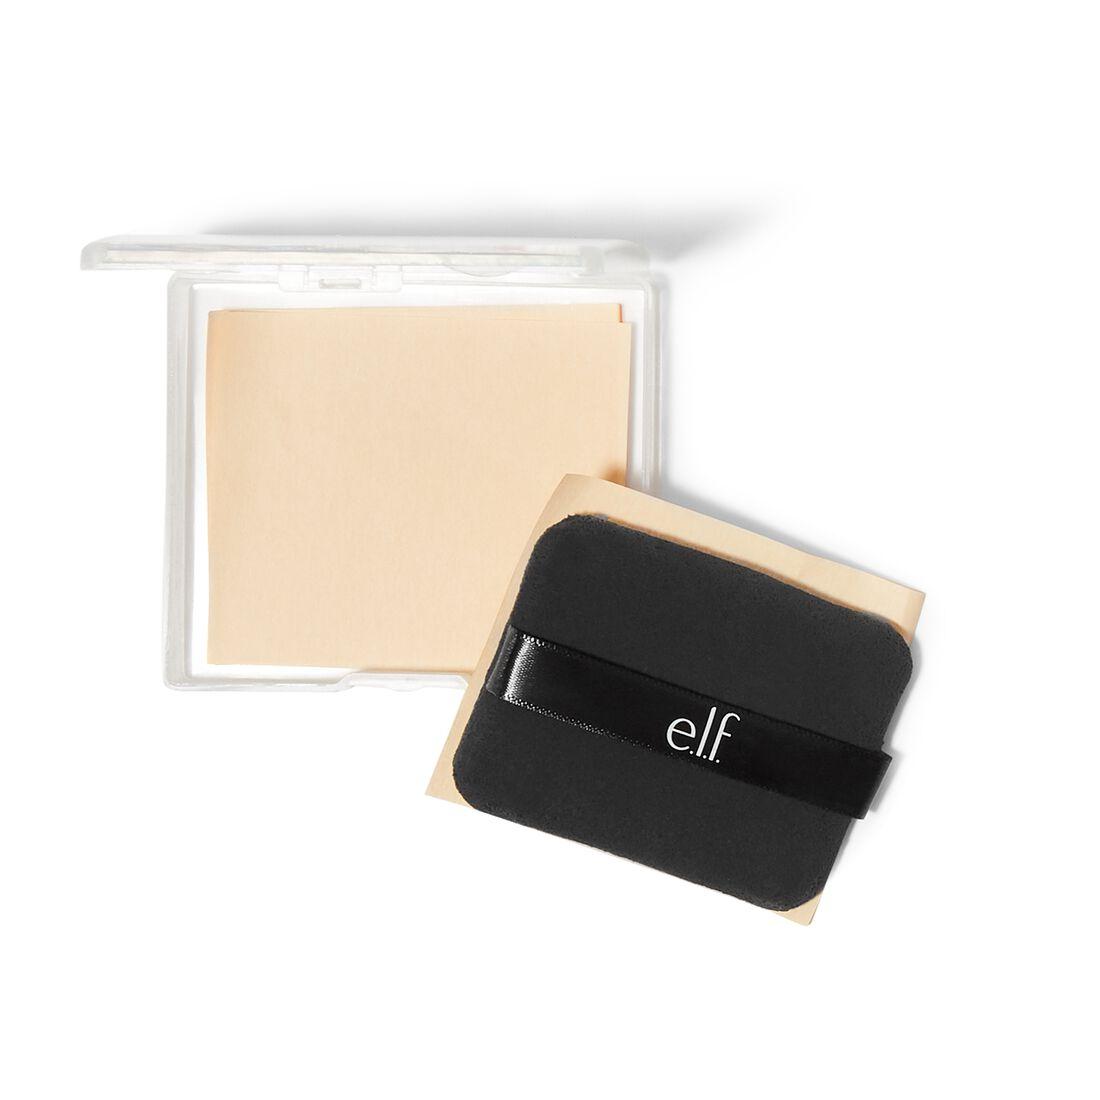 e.l.f. Cosmetics - Mattifying Blotting Papers